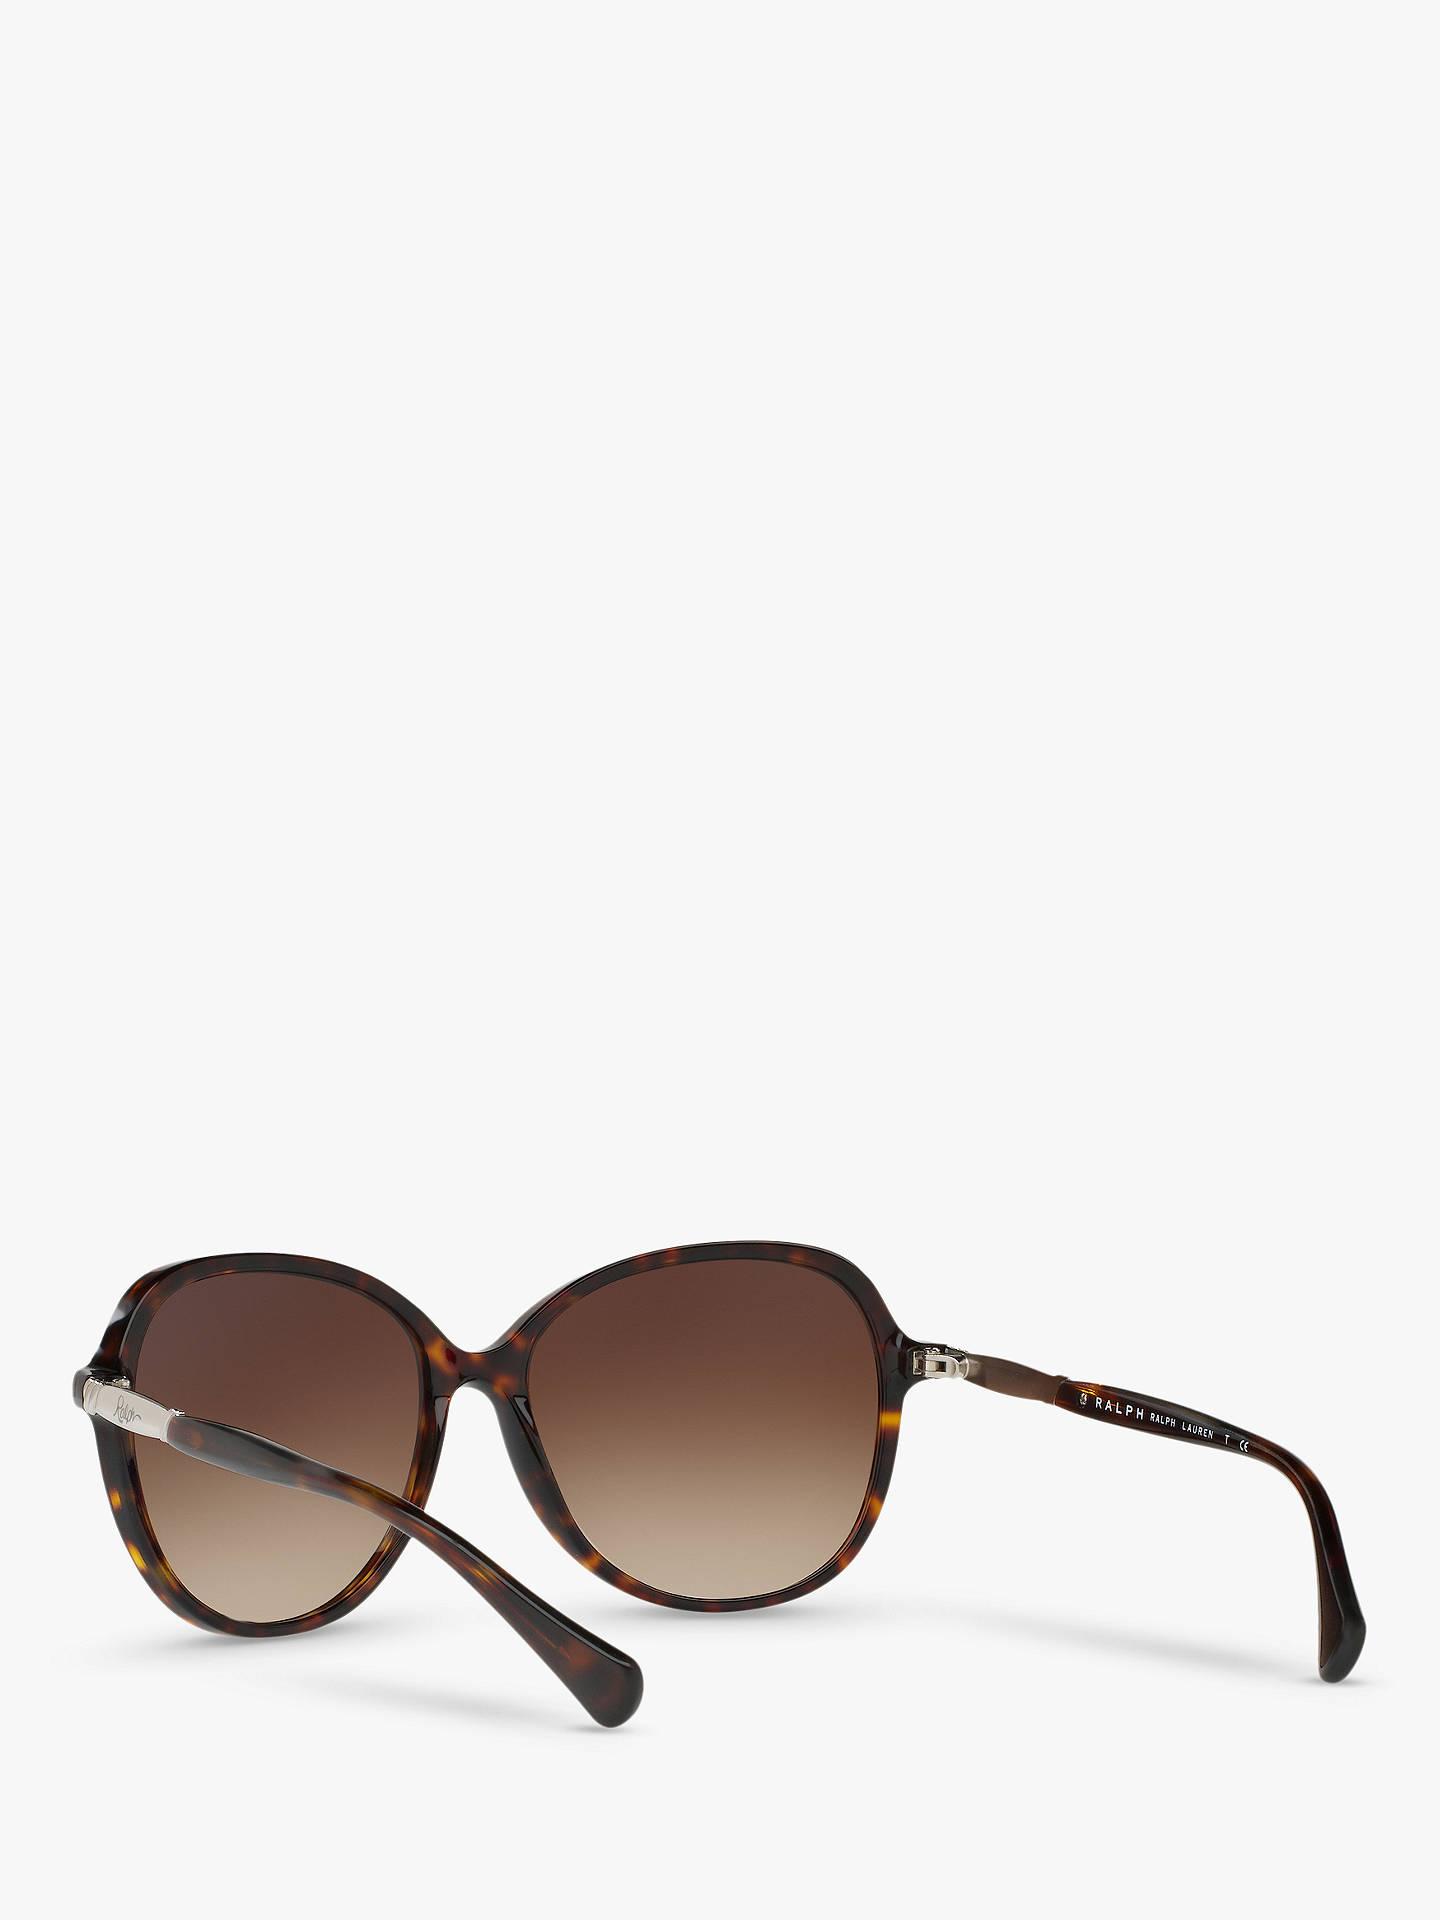 e46234ae83f4 Buy Ralph RA5220 Women's Oversize Square Sunglasses, Tortoise/Brown  Gradient Online at johnlewis.